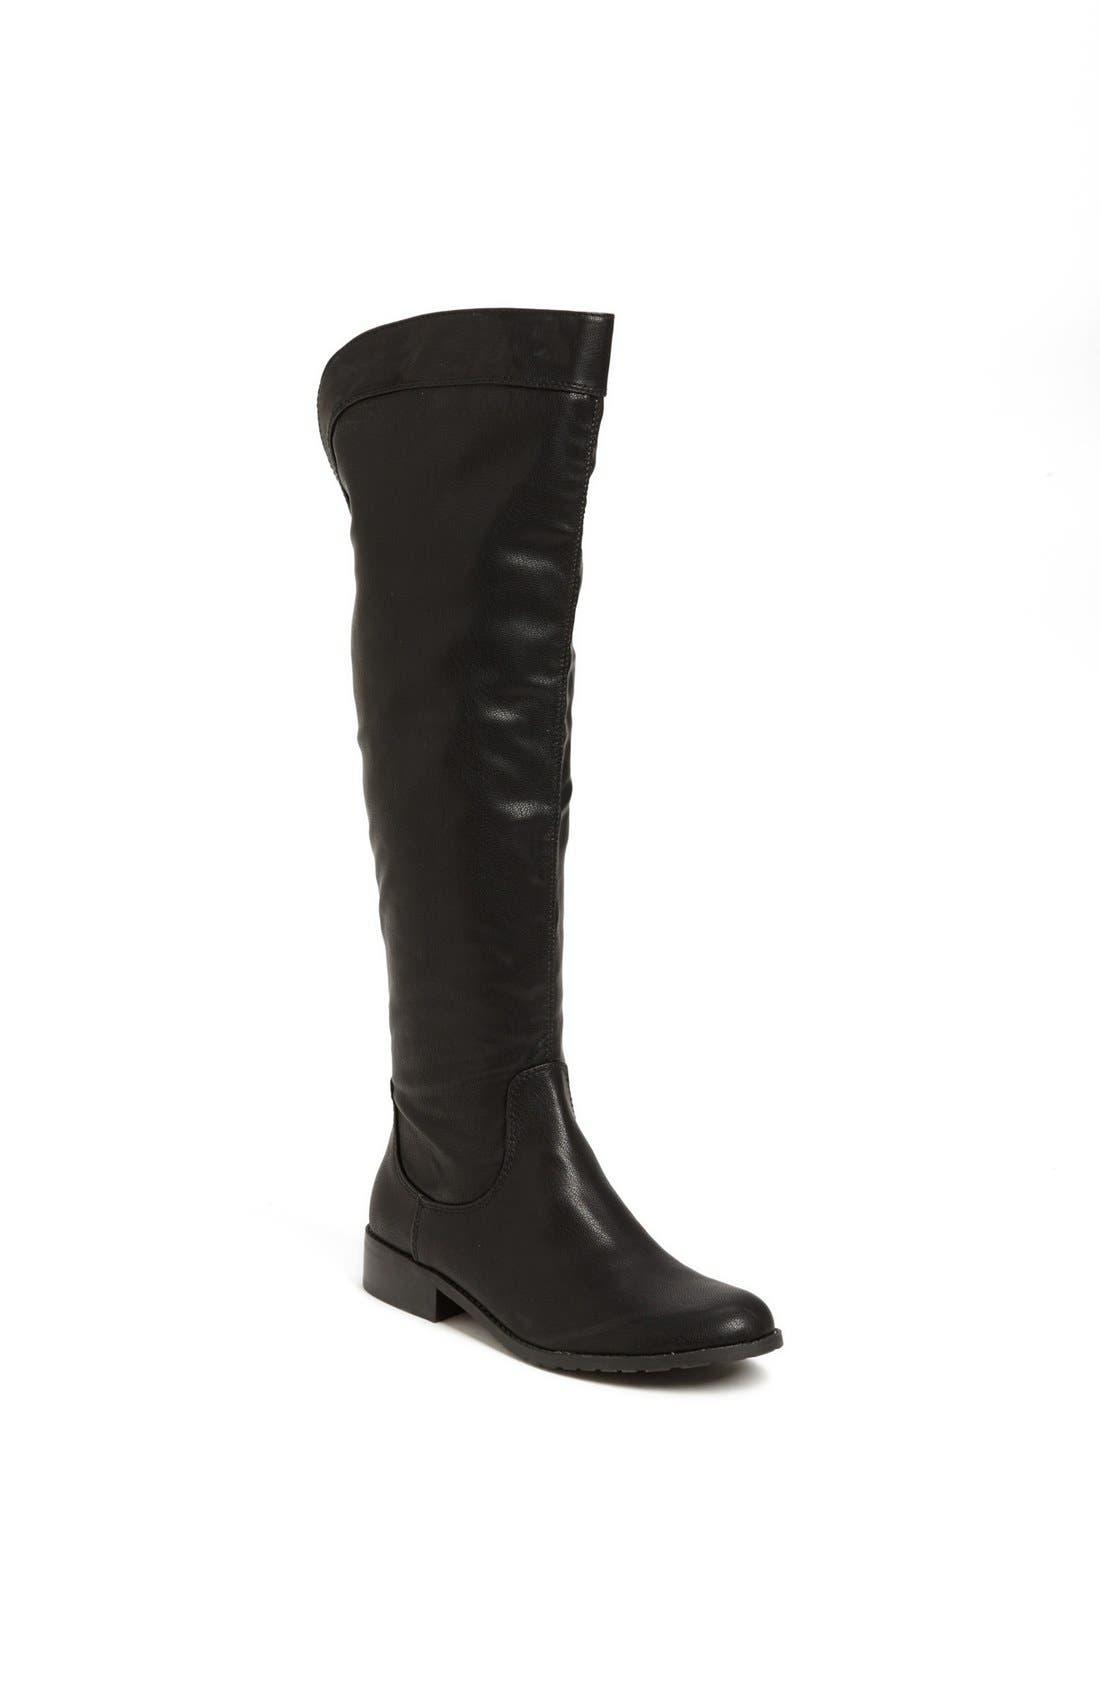 Main Image - Fergie 'Metro' Over the Knee Boot